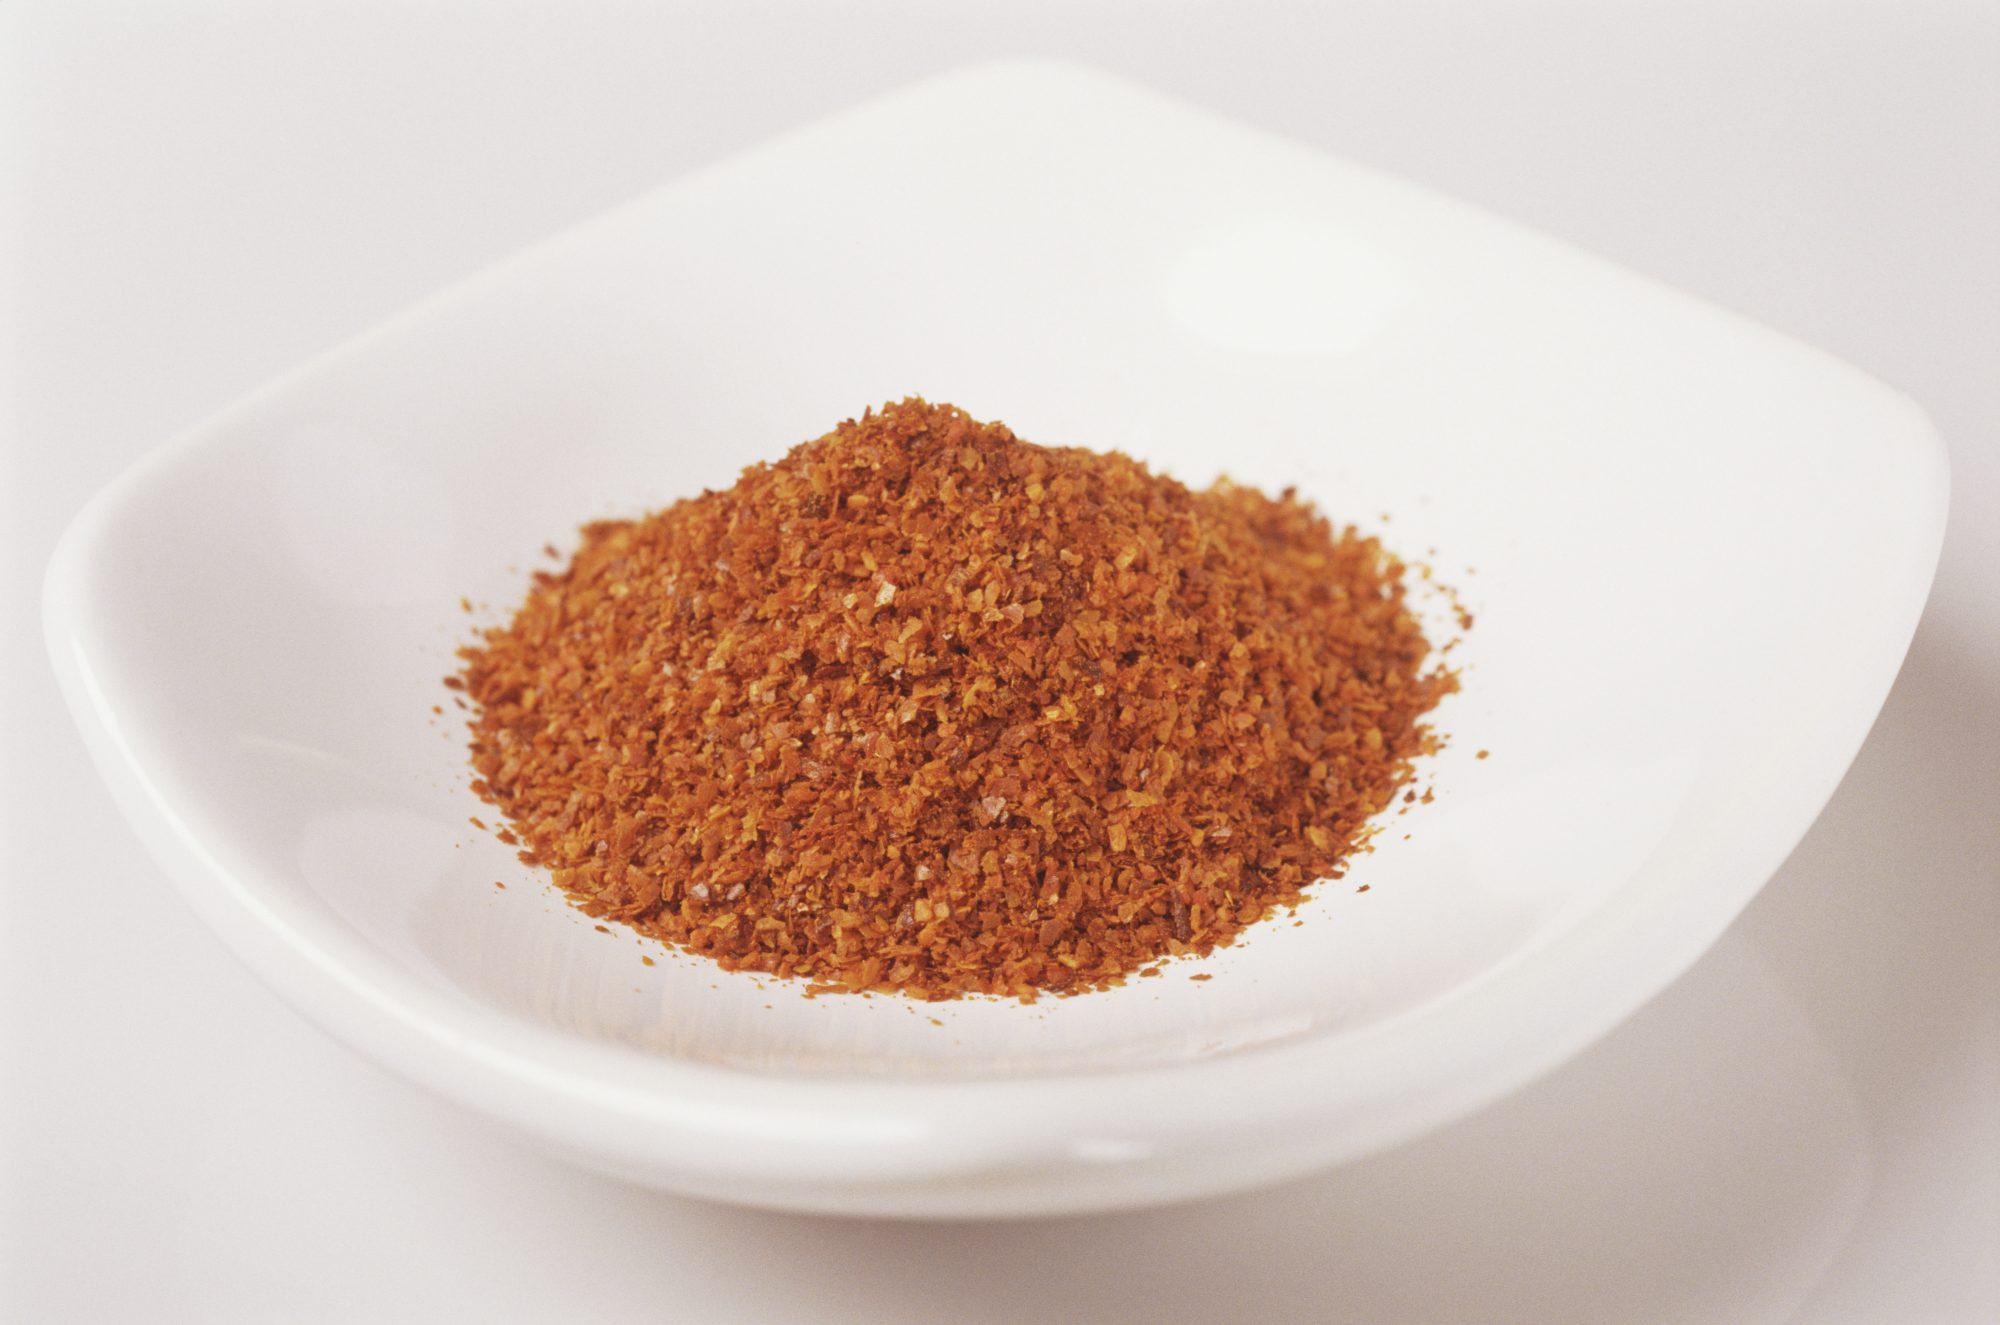 getty togarashi spice image